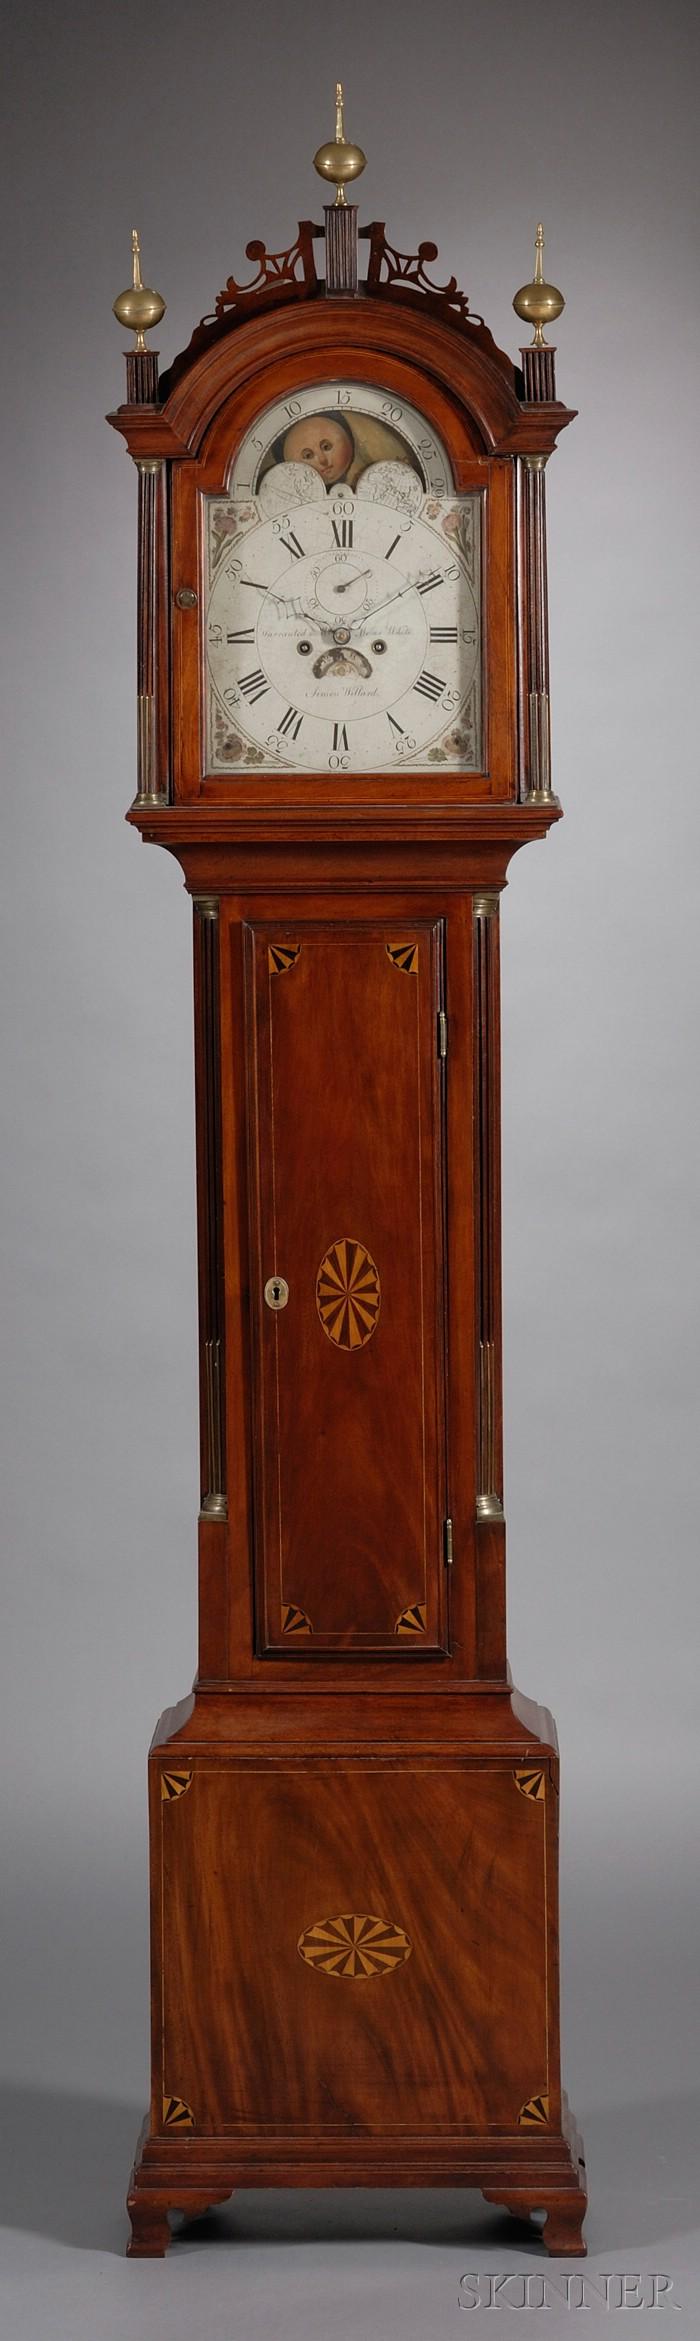 Federal Mahogany Inlaid Tall Case Clock